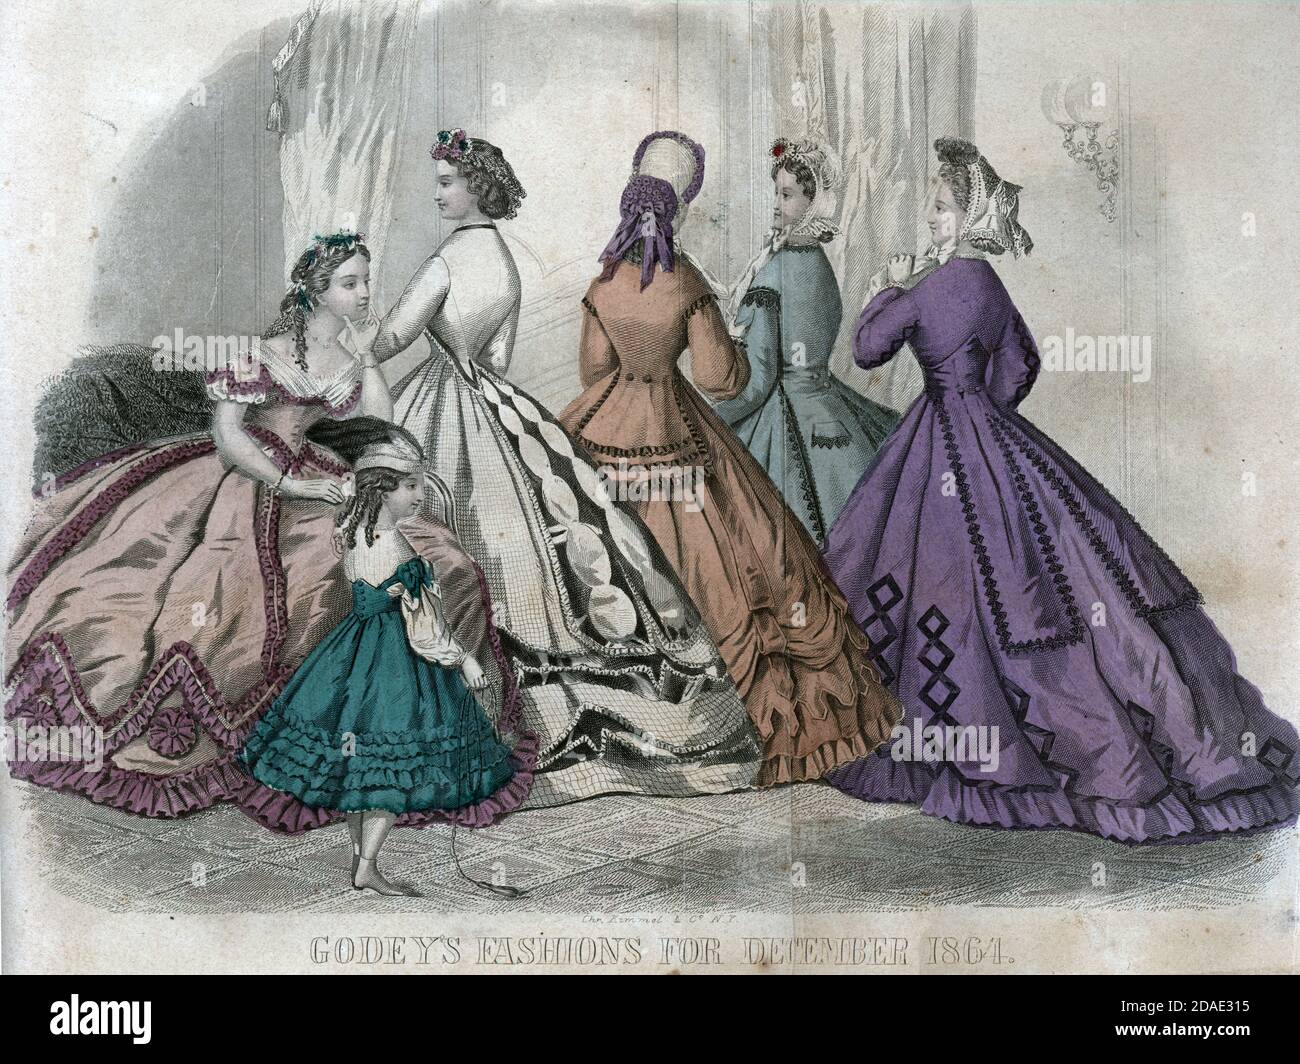 Godey's Fashion para diciembre de 1864 de Godey's Lady's Book and Magazine, diciembre de 1864, volumen LXIX, (volumen 69), Filadelfia, Louis A. Godey, Sarah Josepha Hale, Foto de stock